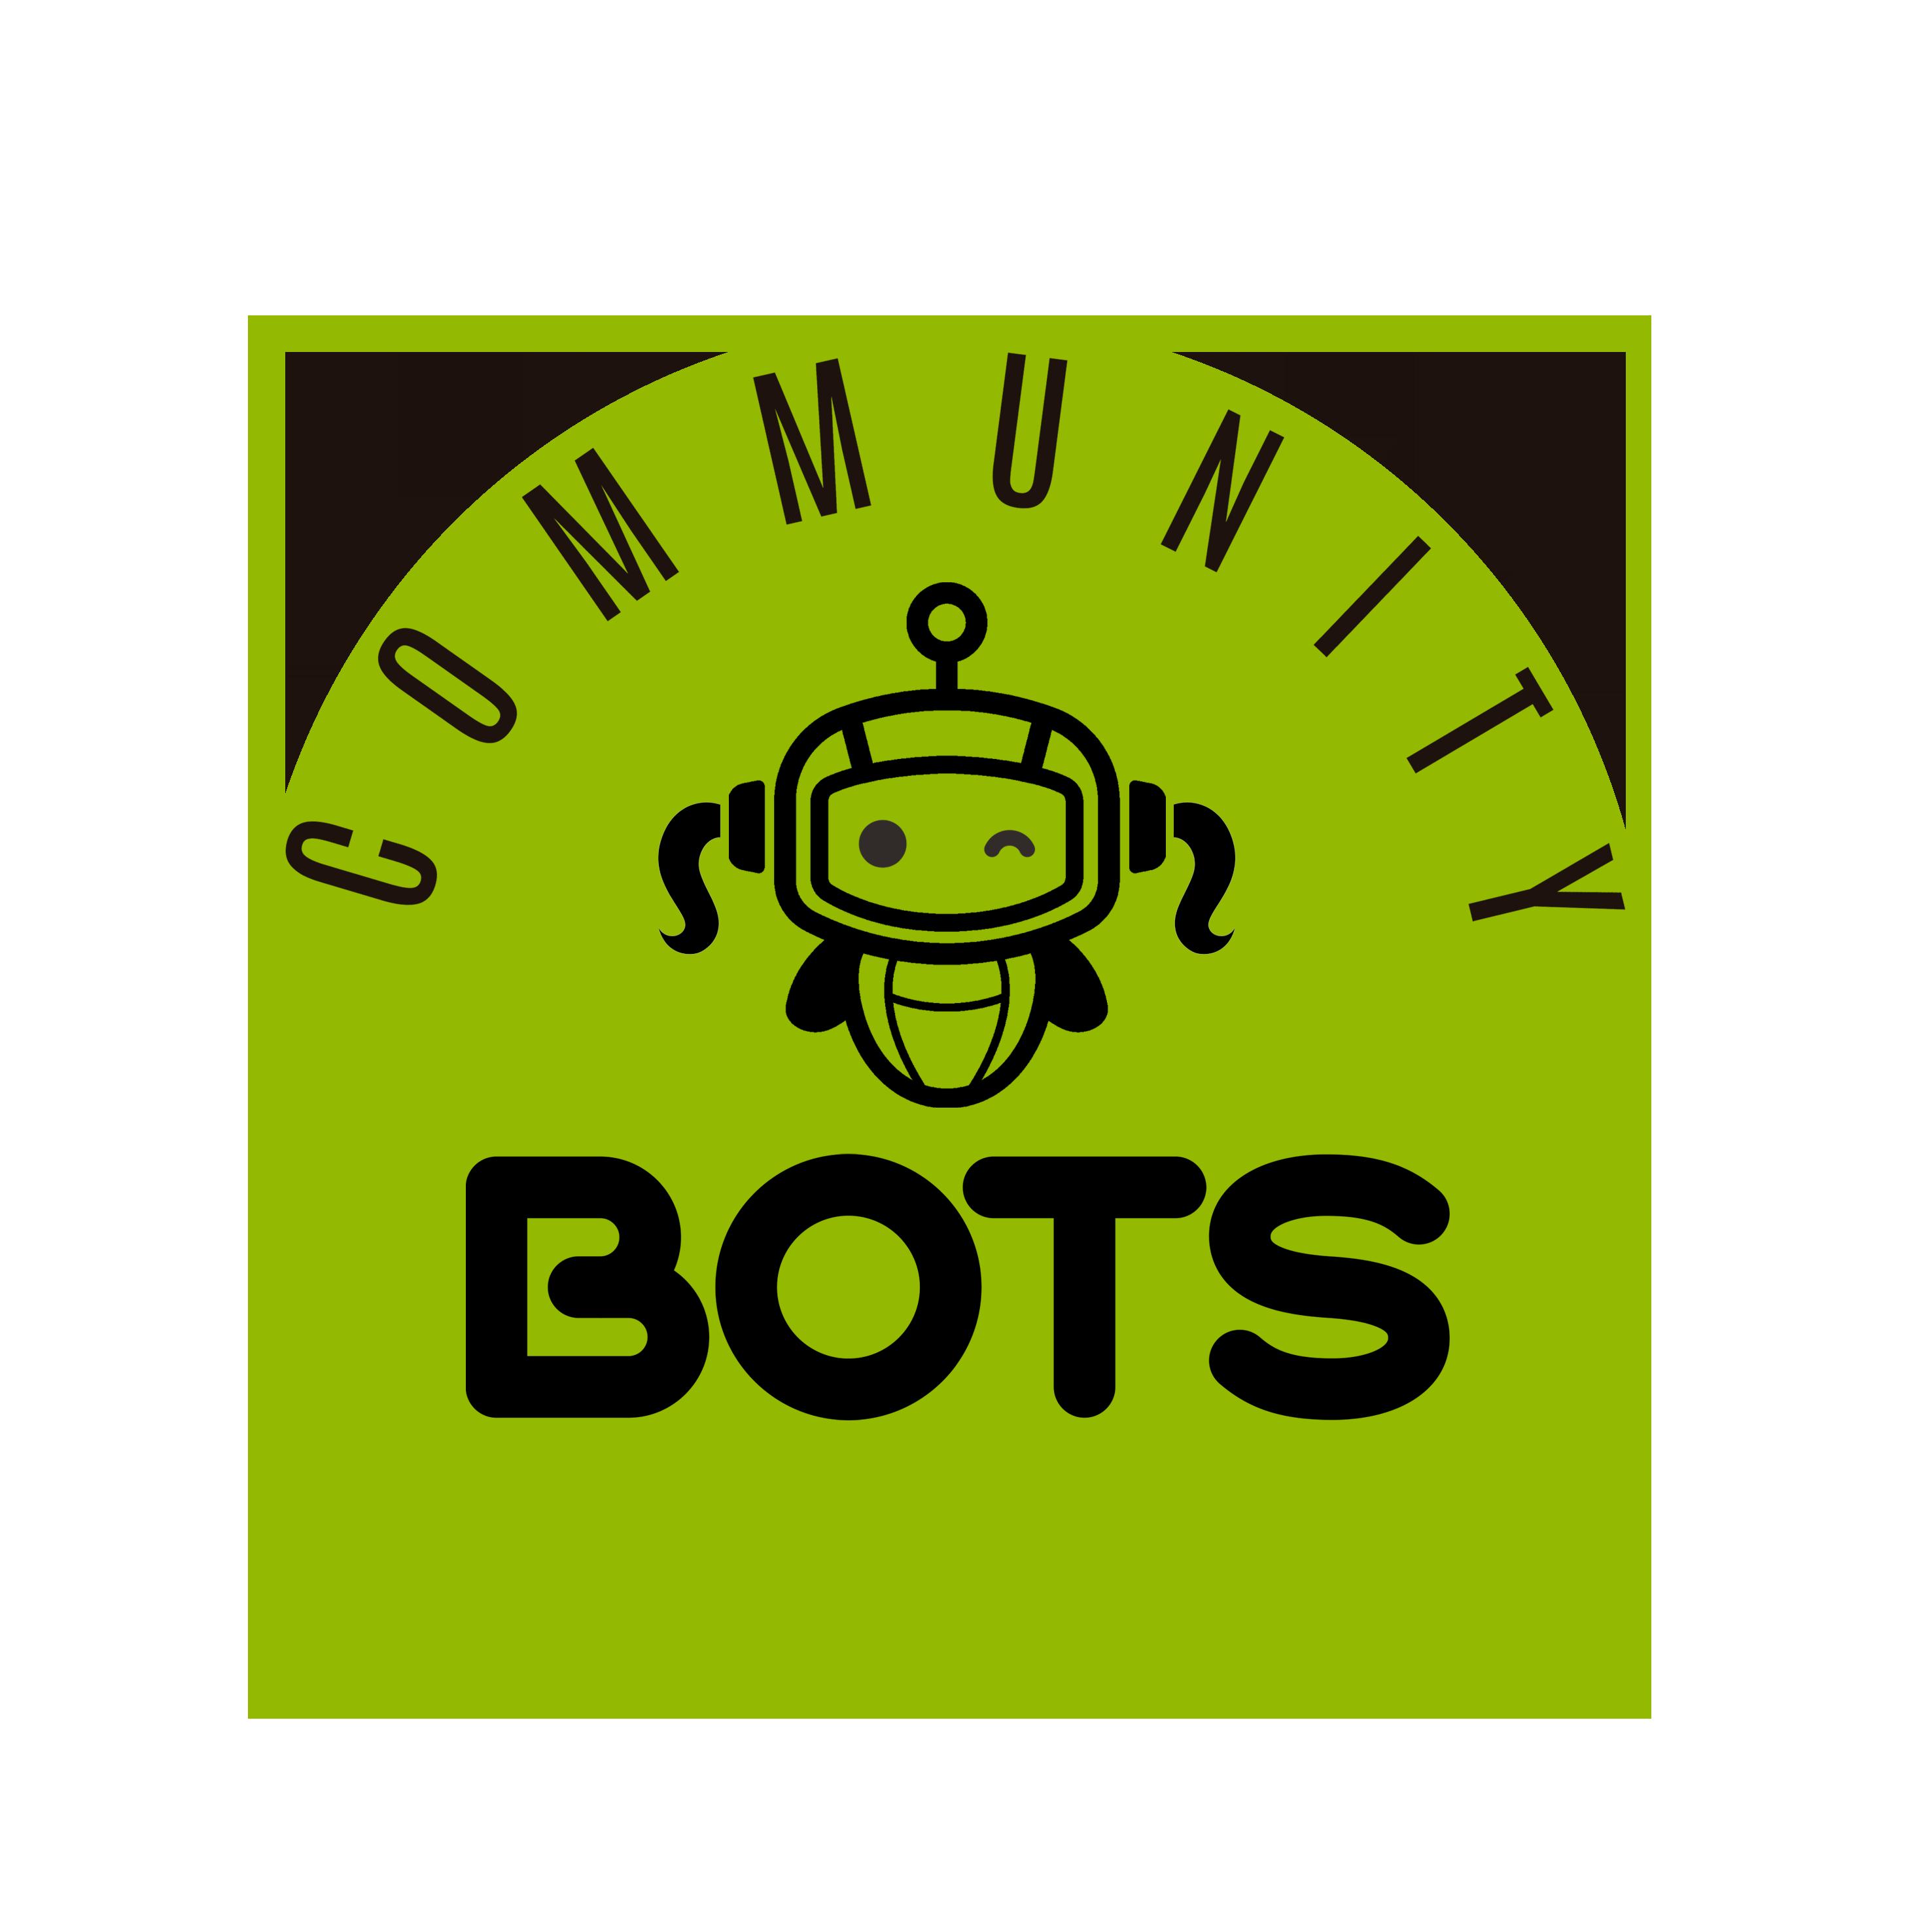 Community Bots